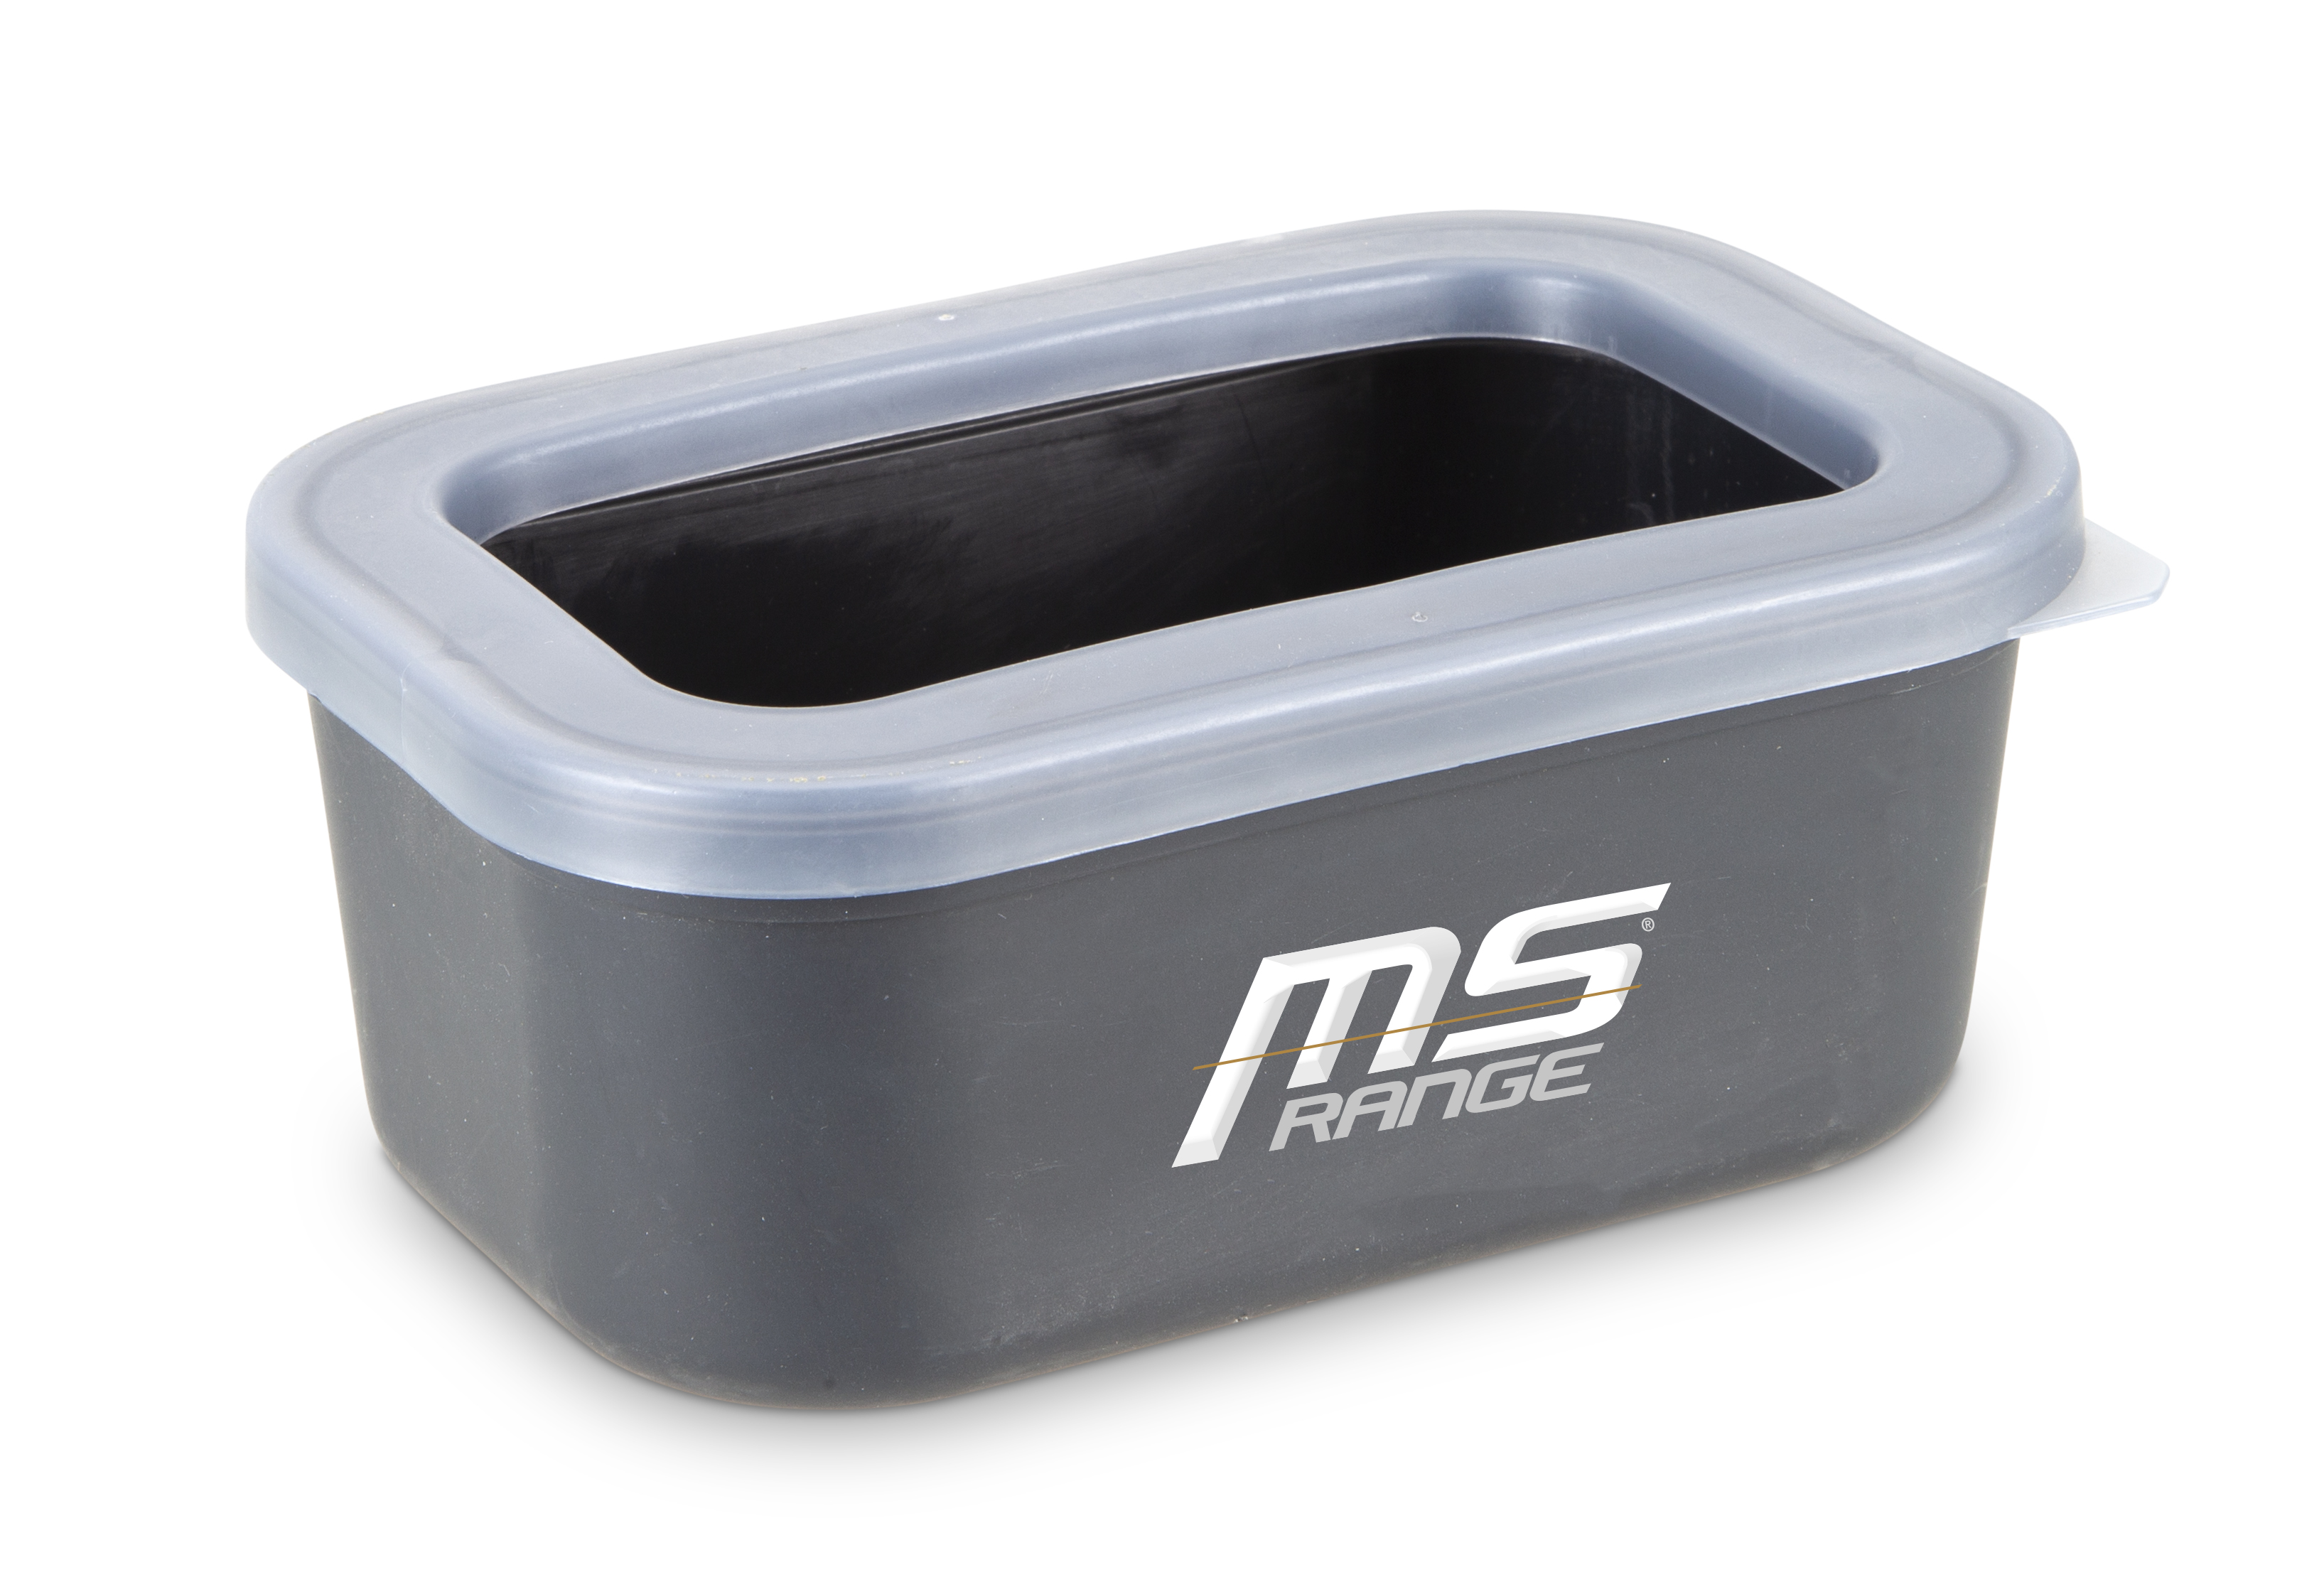 Box MS Range Bait Box 0.75 l Možnost C